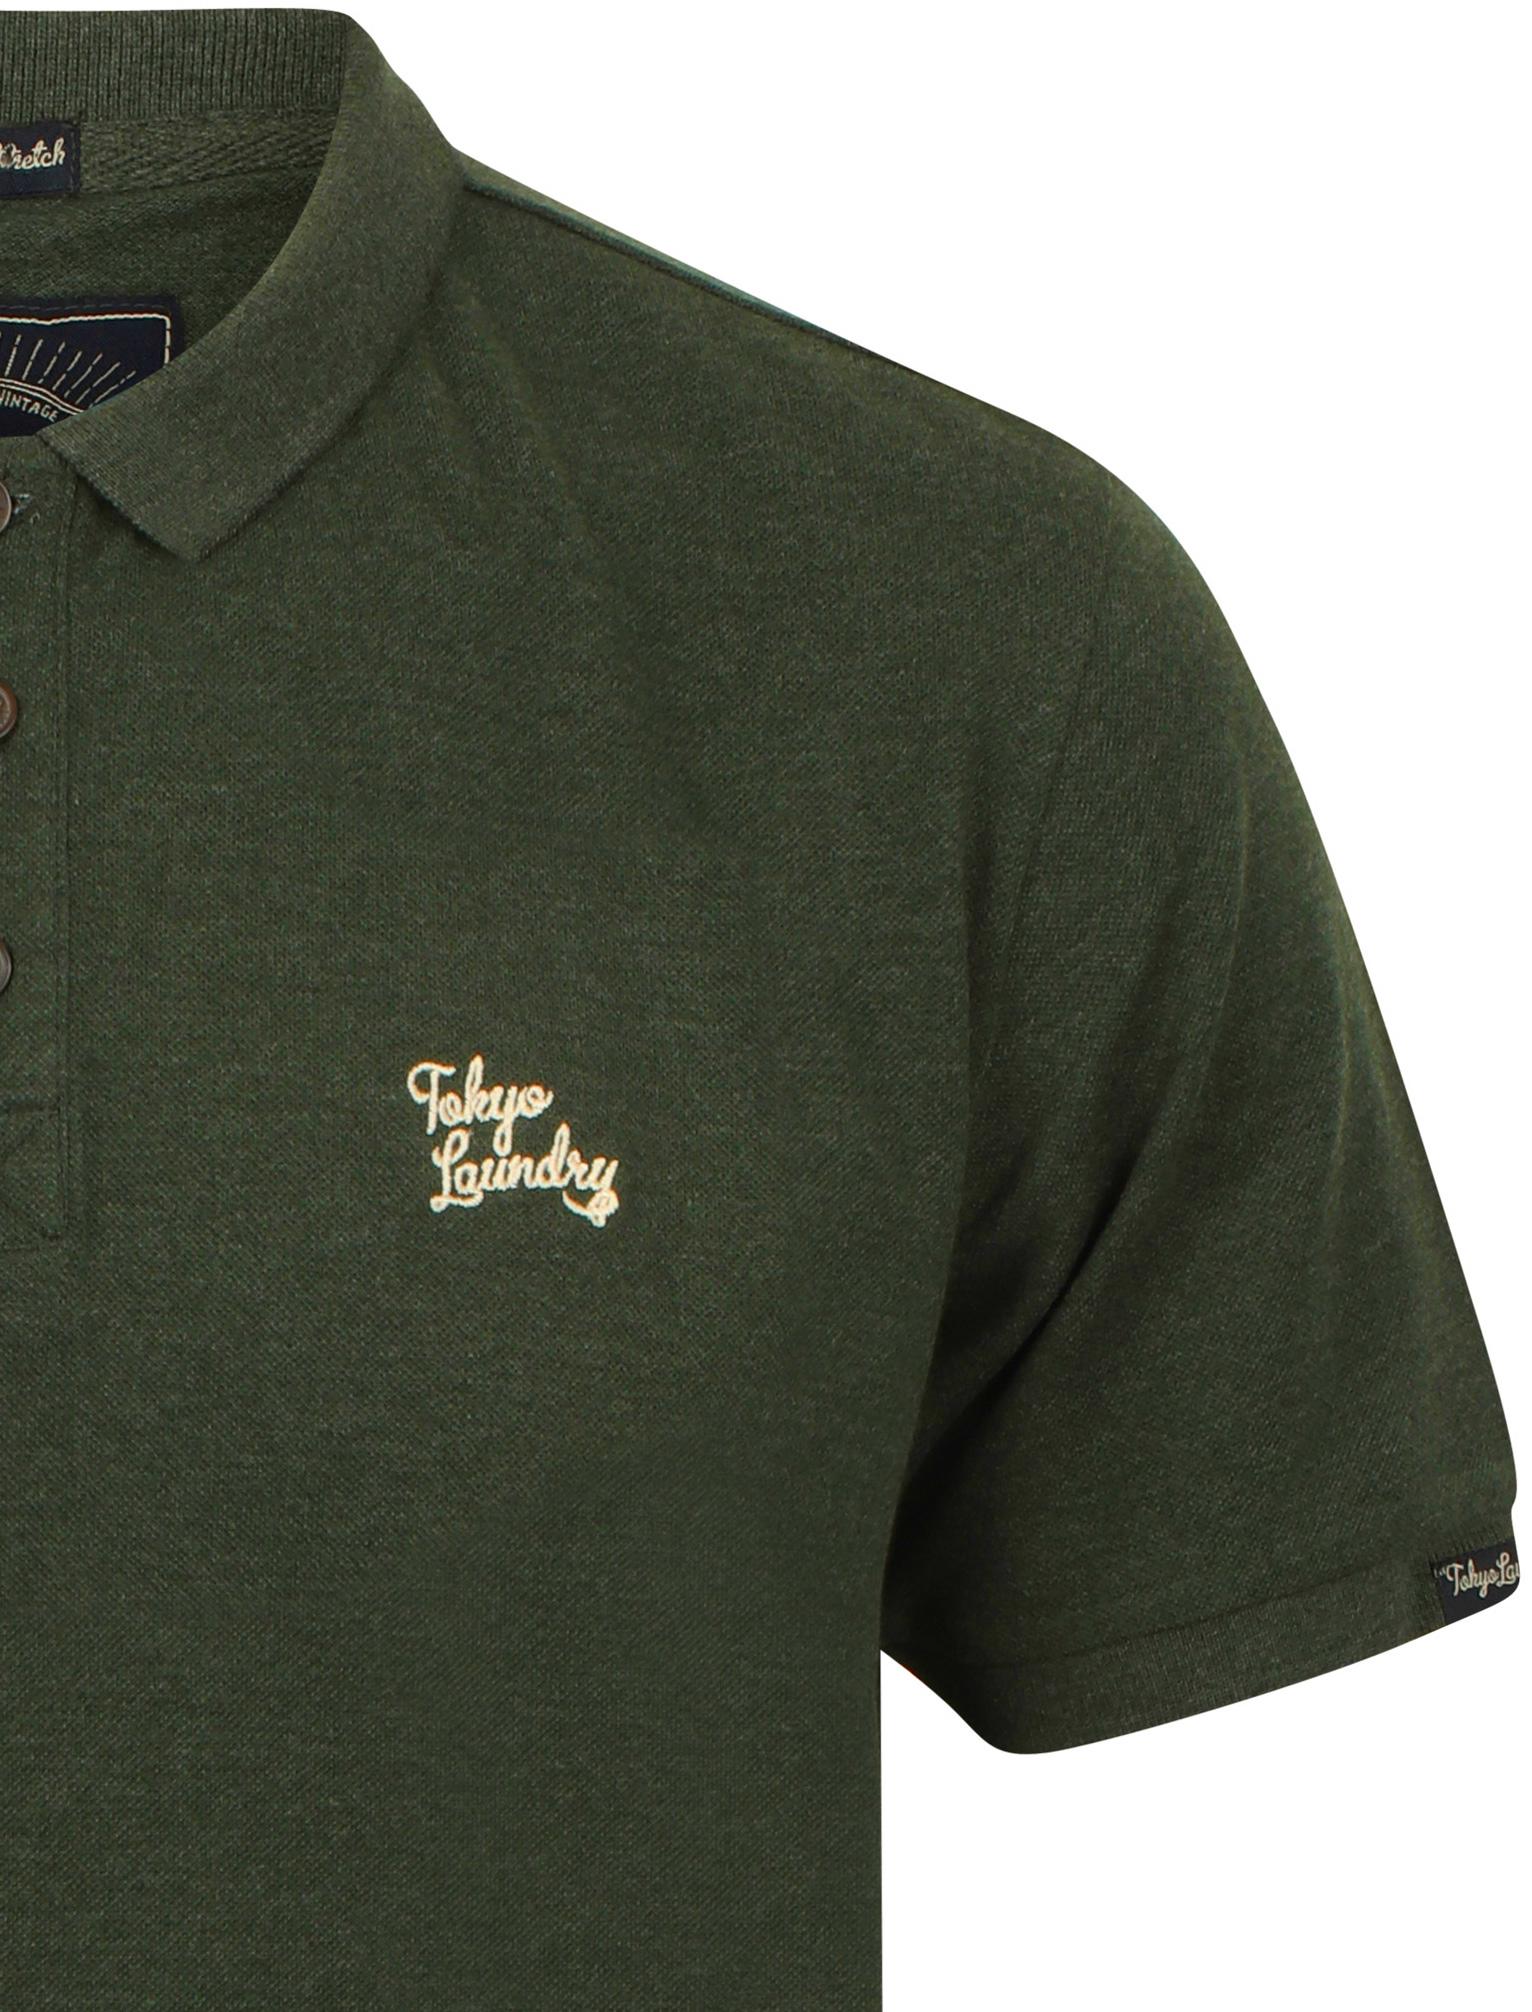 New-Mens-Tokyo-Laundry-Branded-Kuusamo-Cotton-Rich-Pique-Polo-Shirt-Size-S-XXL thumbnail 28